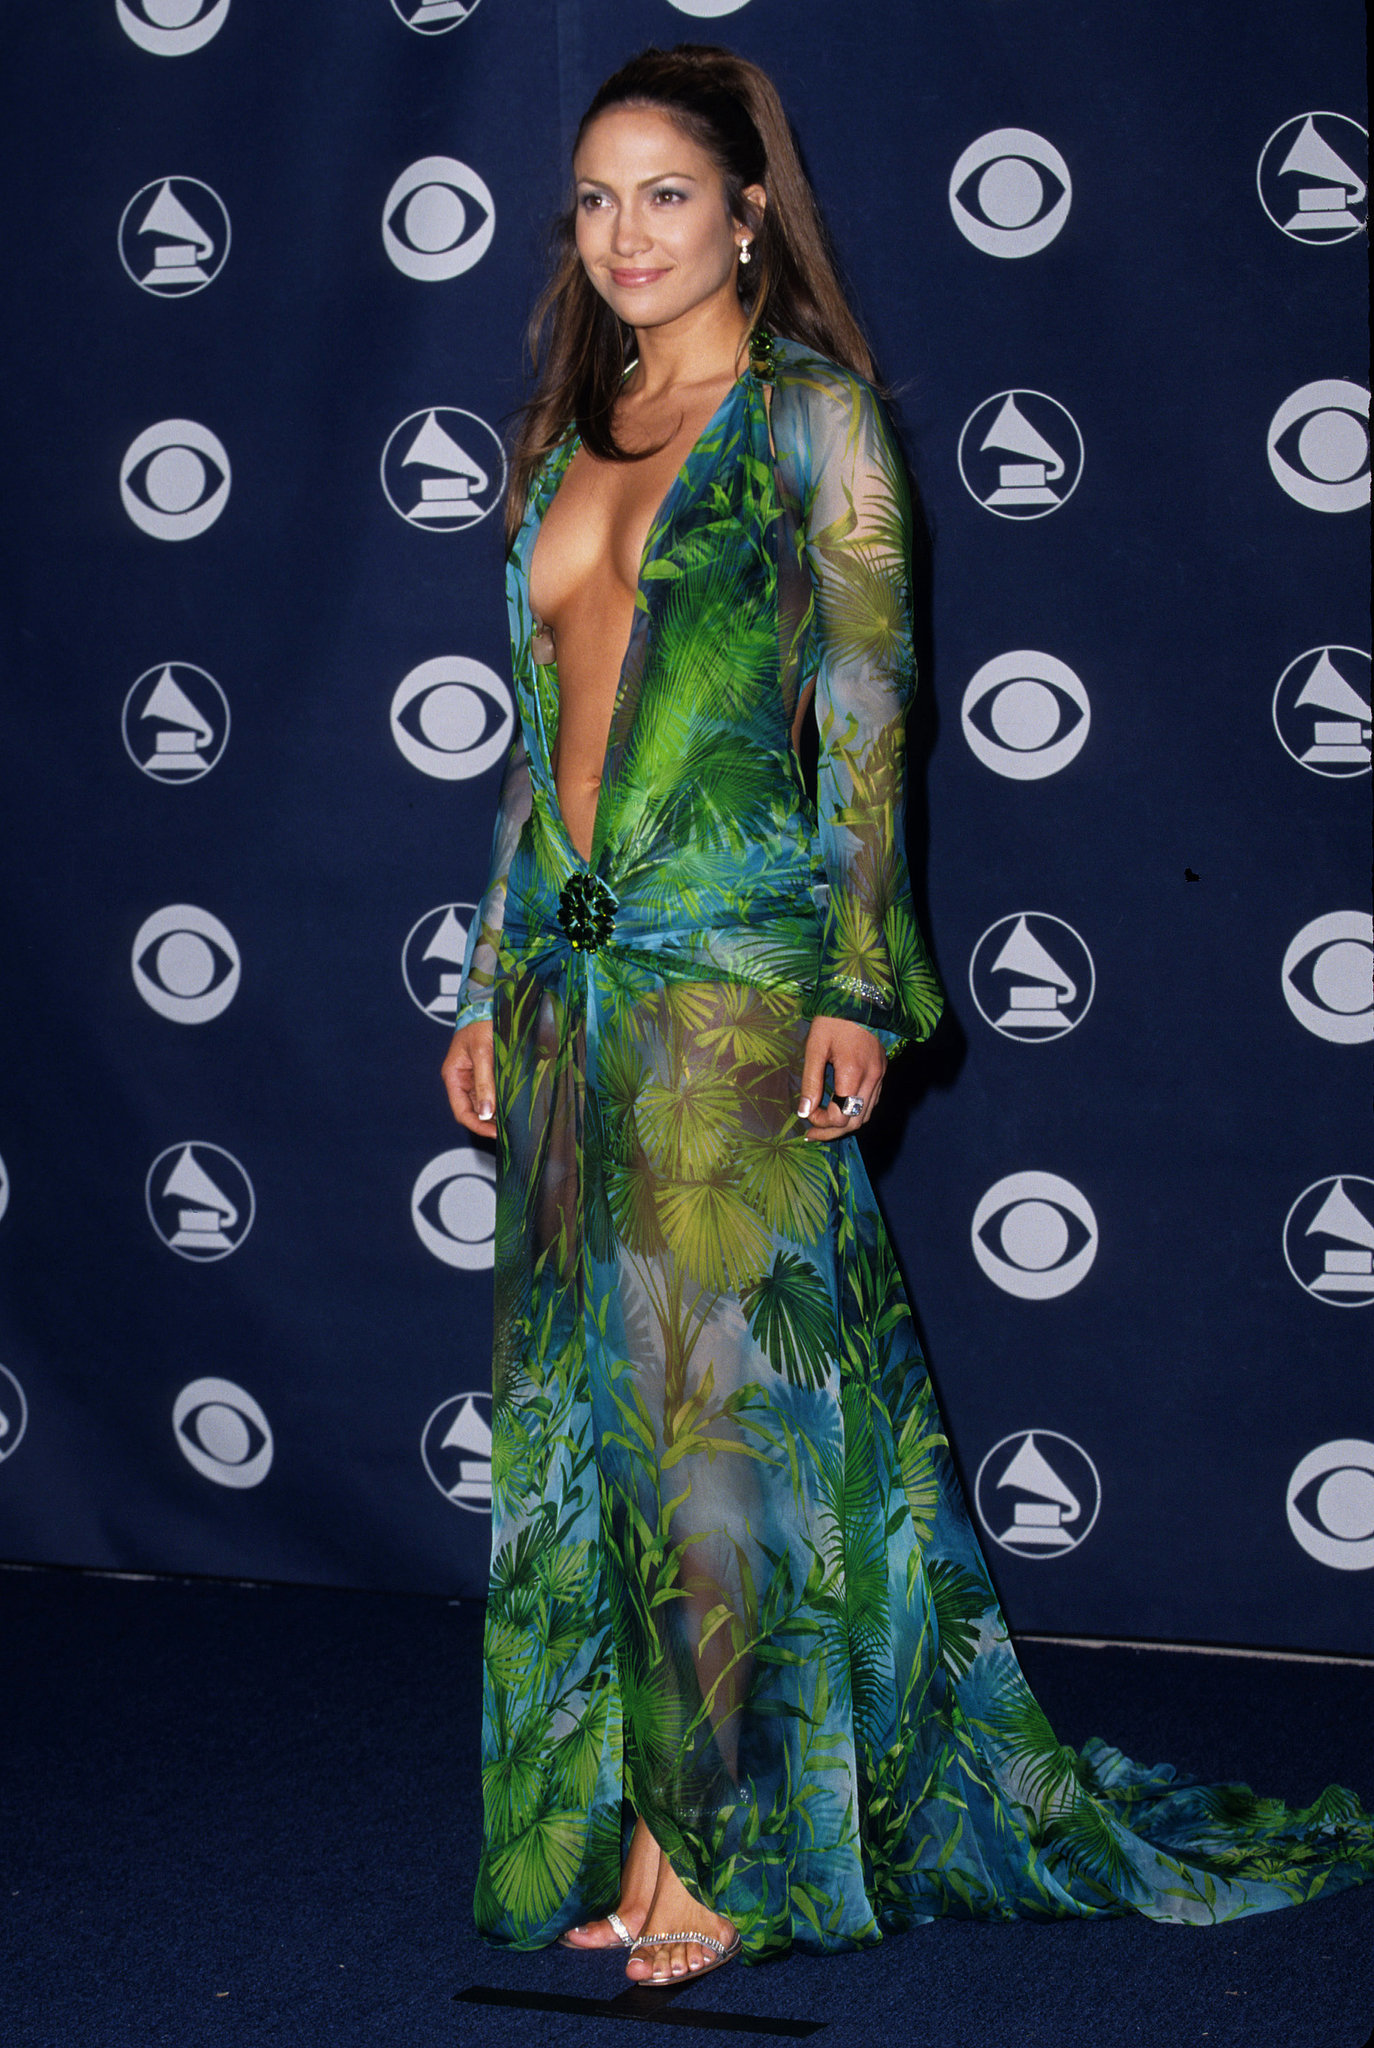 Jennifer Lopez in Versace at the Grammy Awards